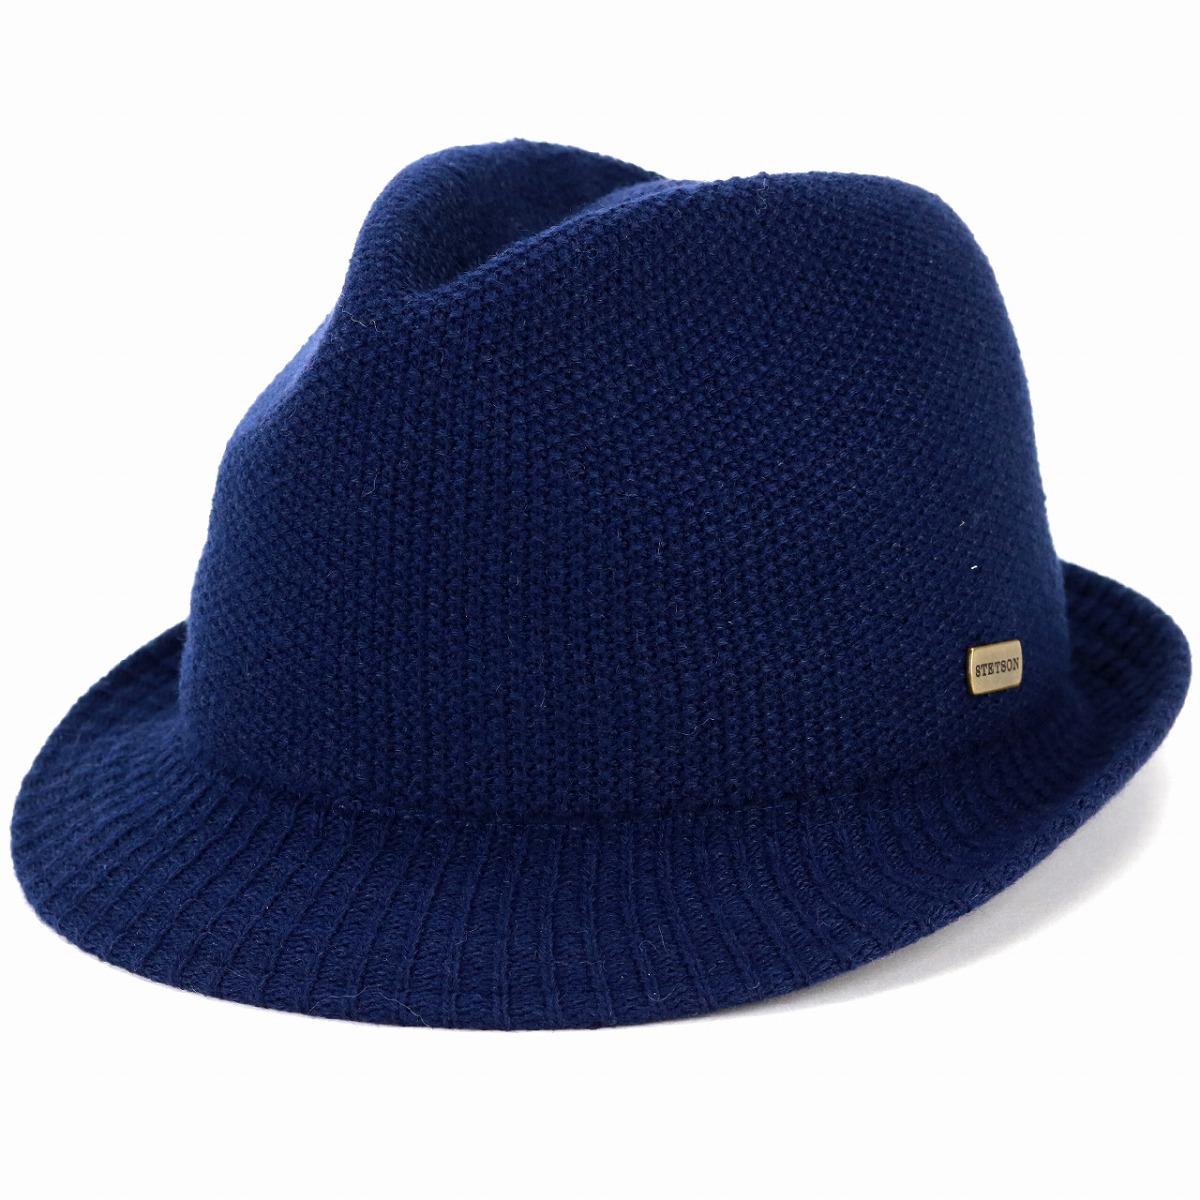 2e6fc0ecc7944 ELEHELM HAT STORE  The size L LL size dark blue navy  fedora ...